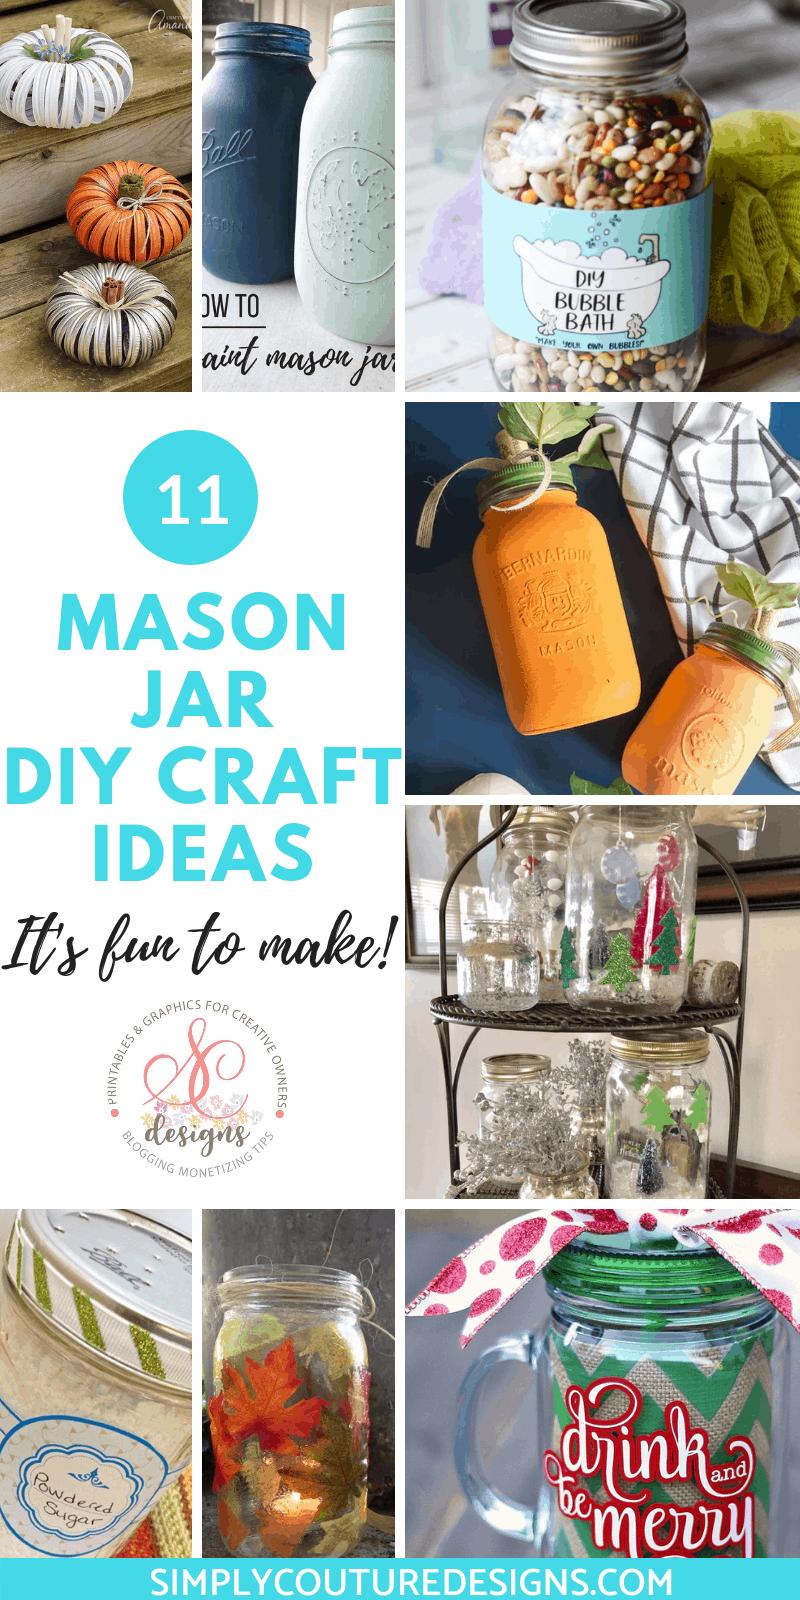 Mason Jar Diy Craft Ideas Simply Couture Designs